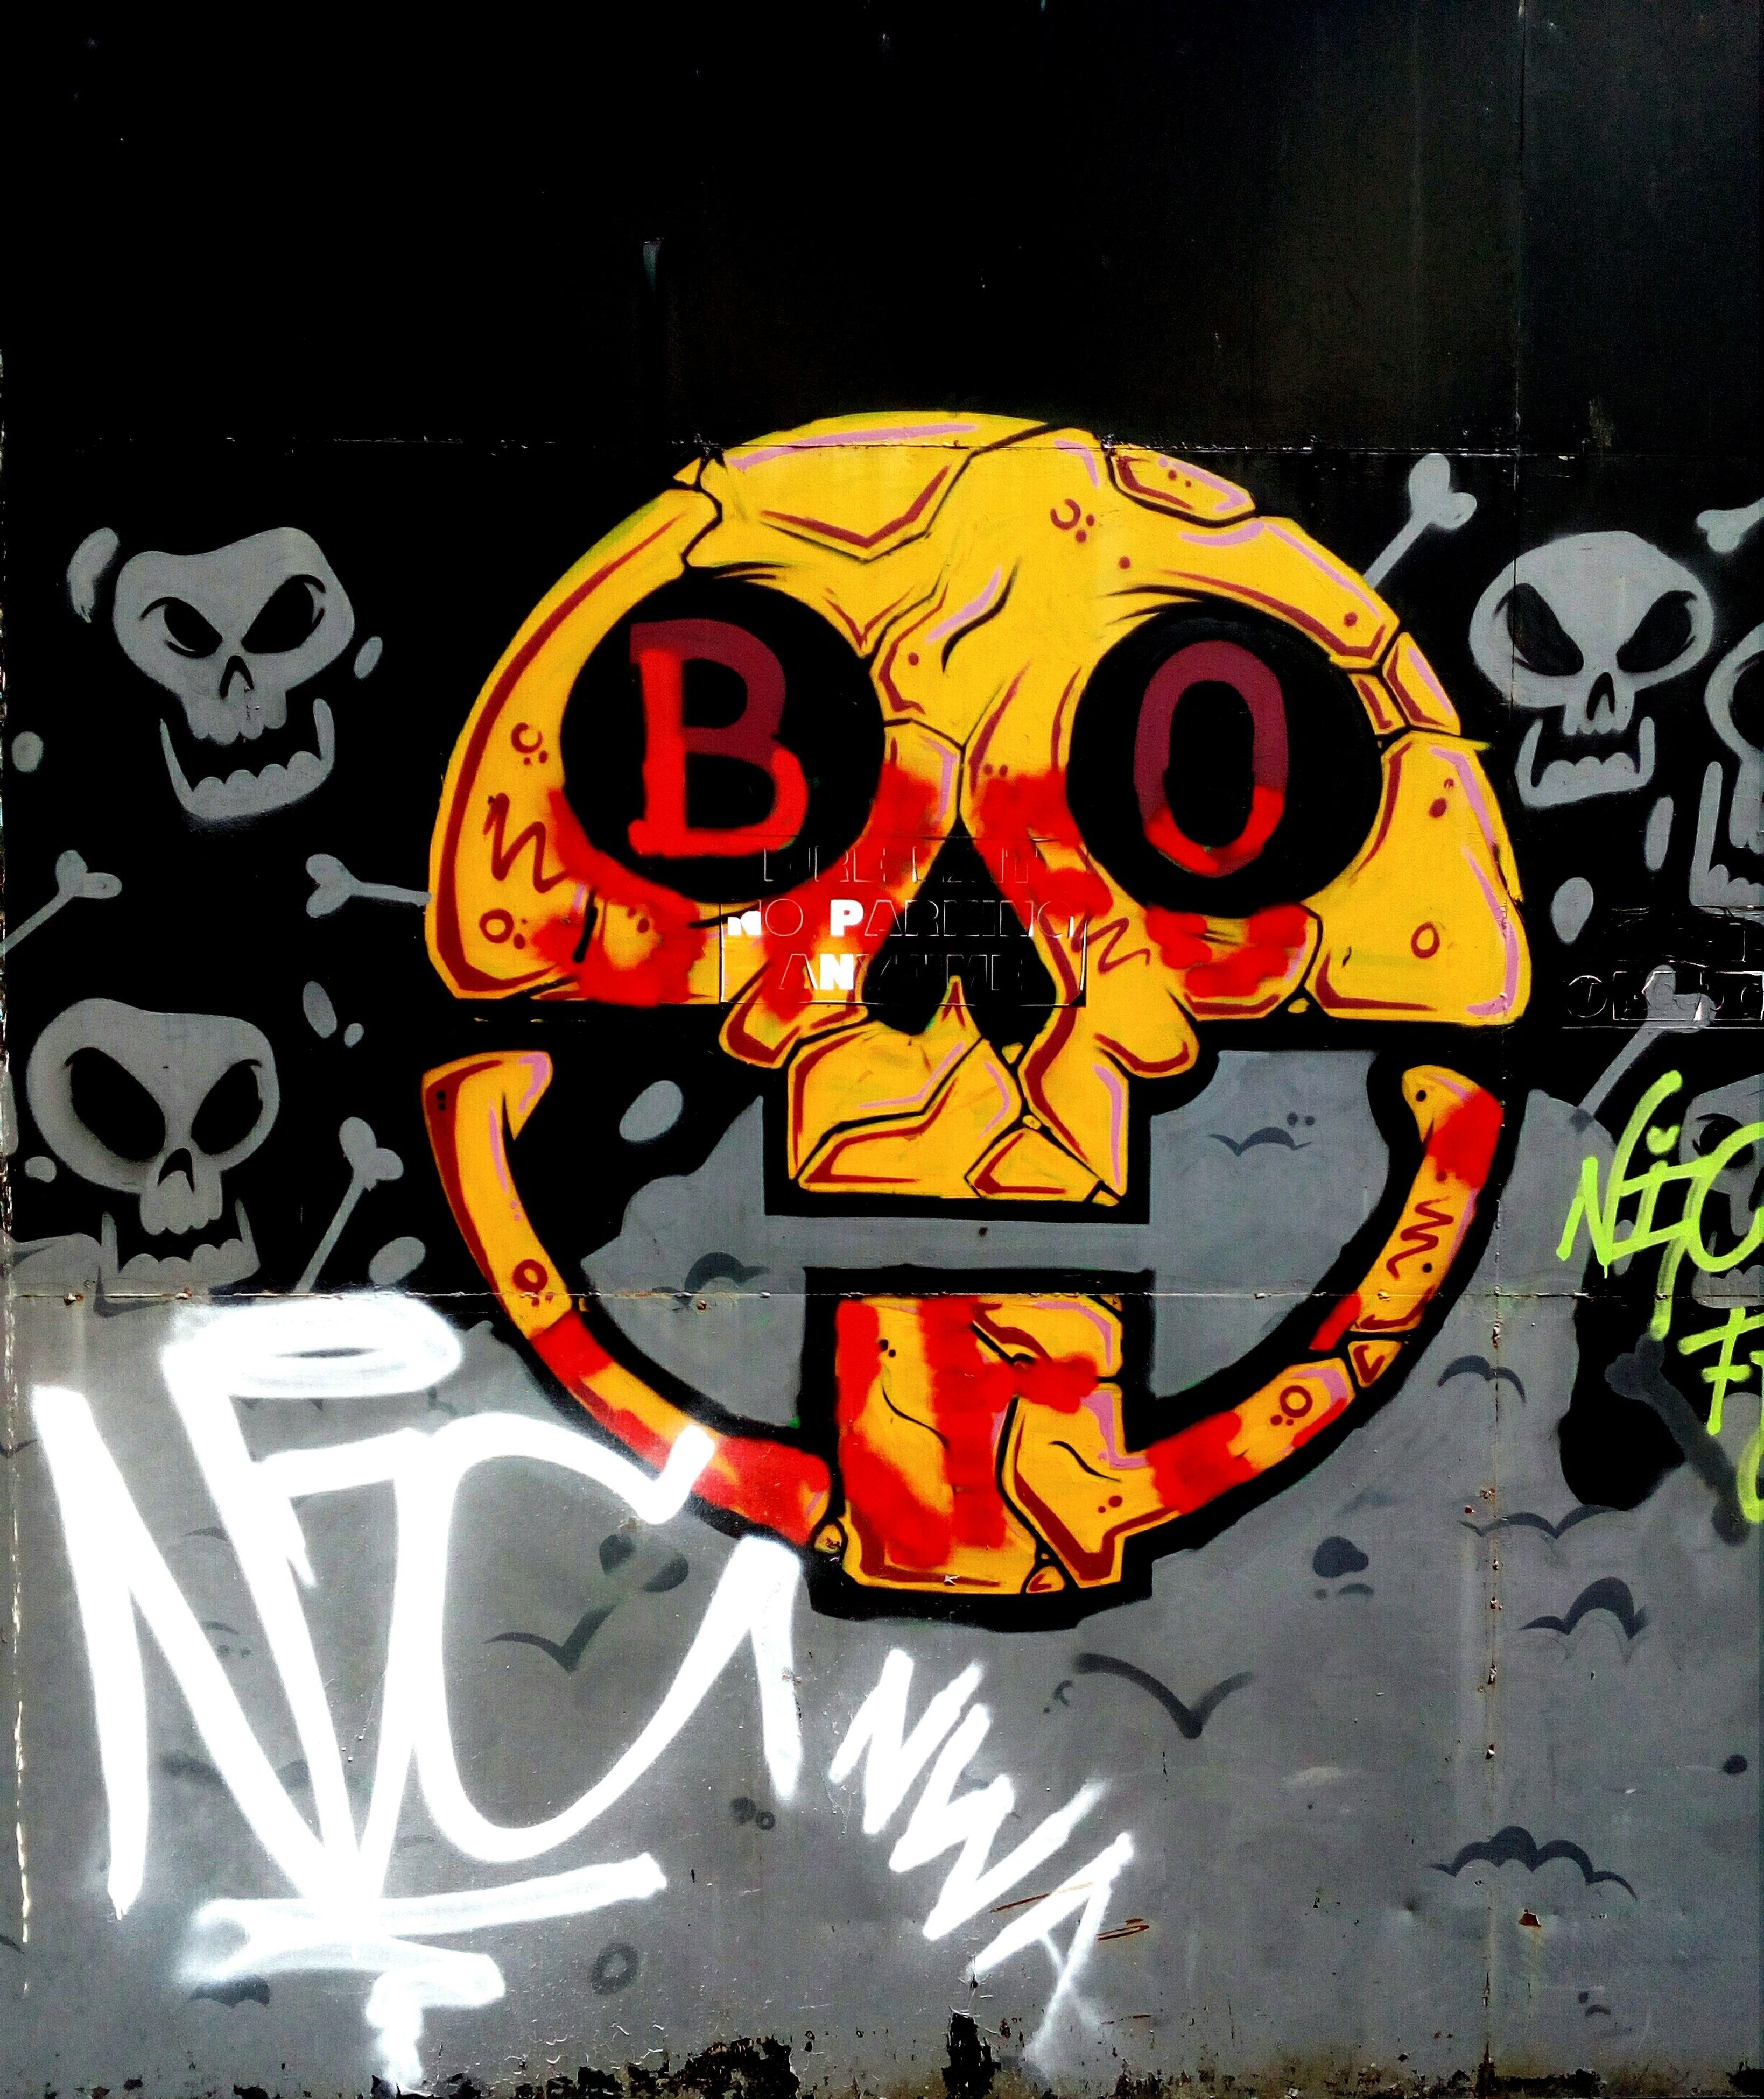 night, graffiti, no people, halloween, outdoors, anthropomorphic face, multi colored, close-up, jack o lantern